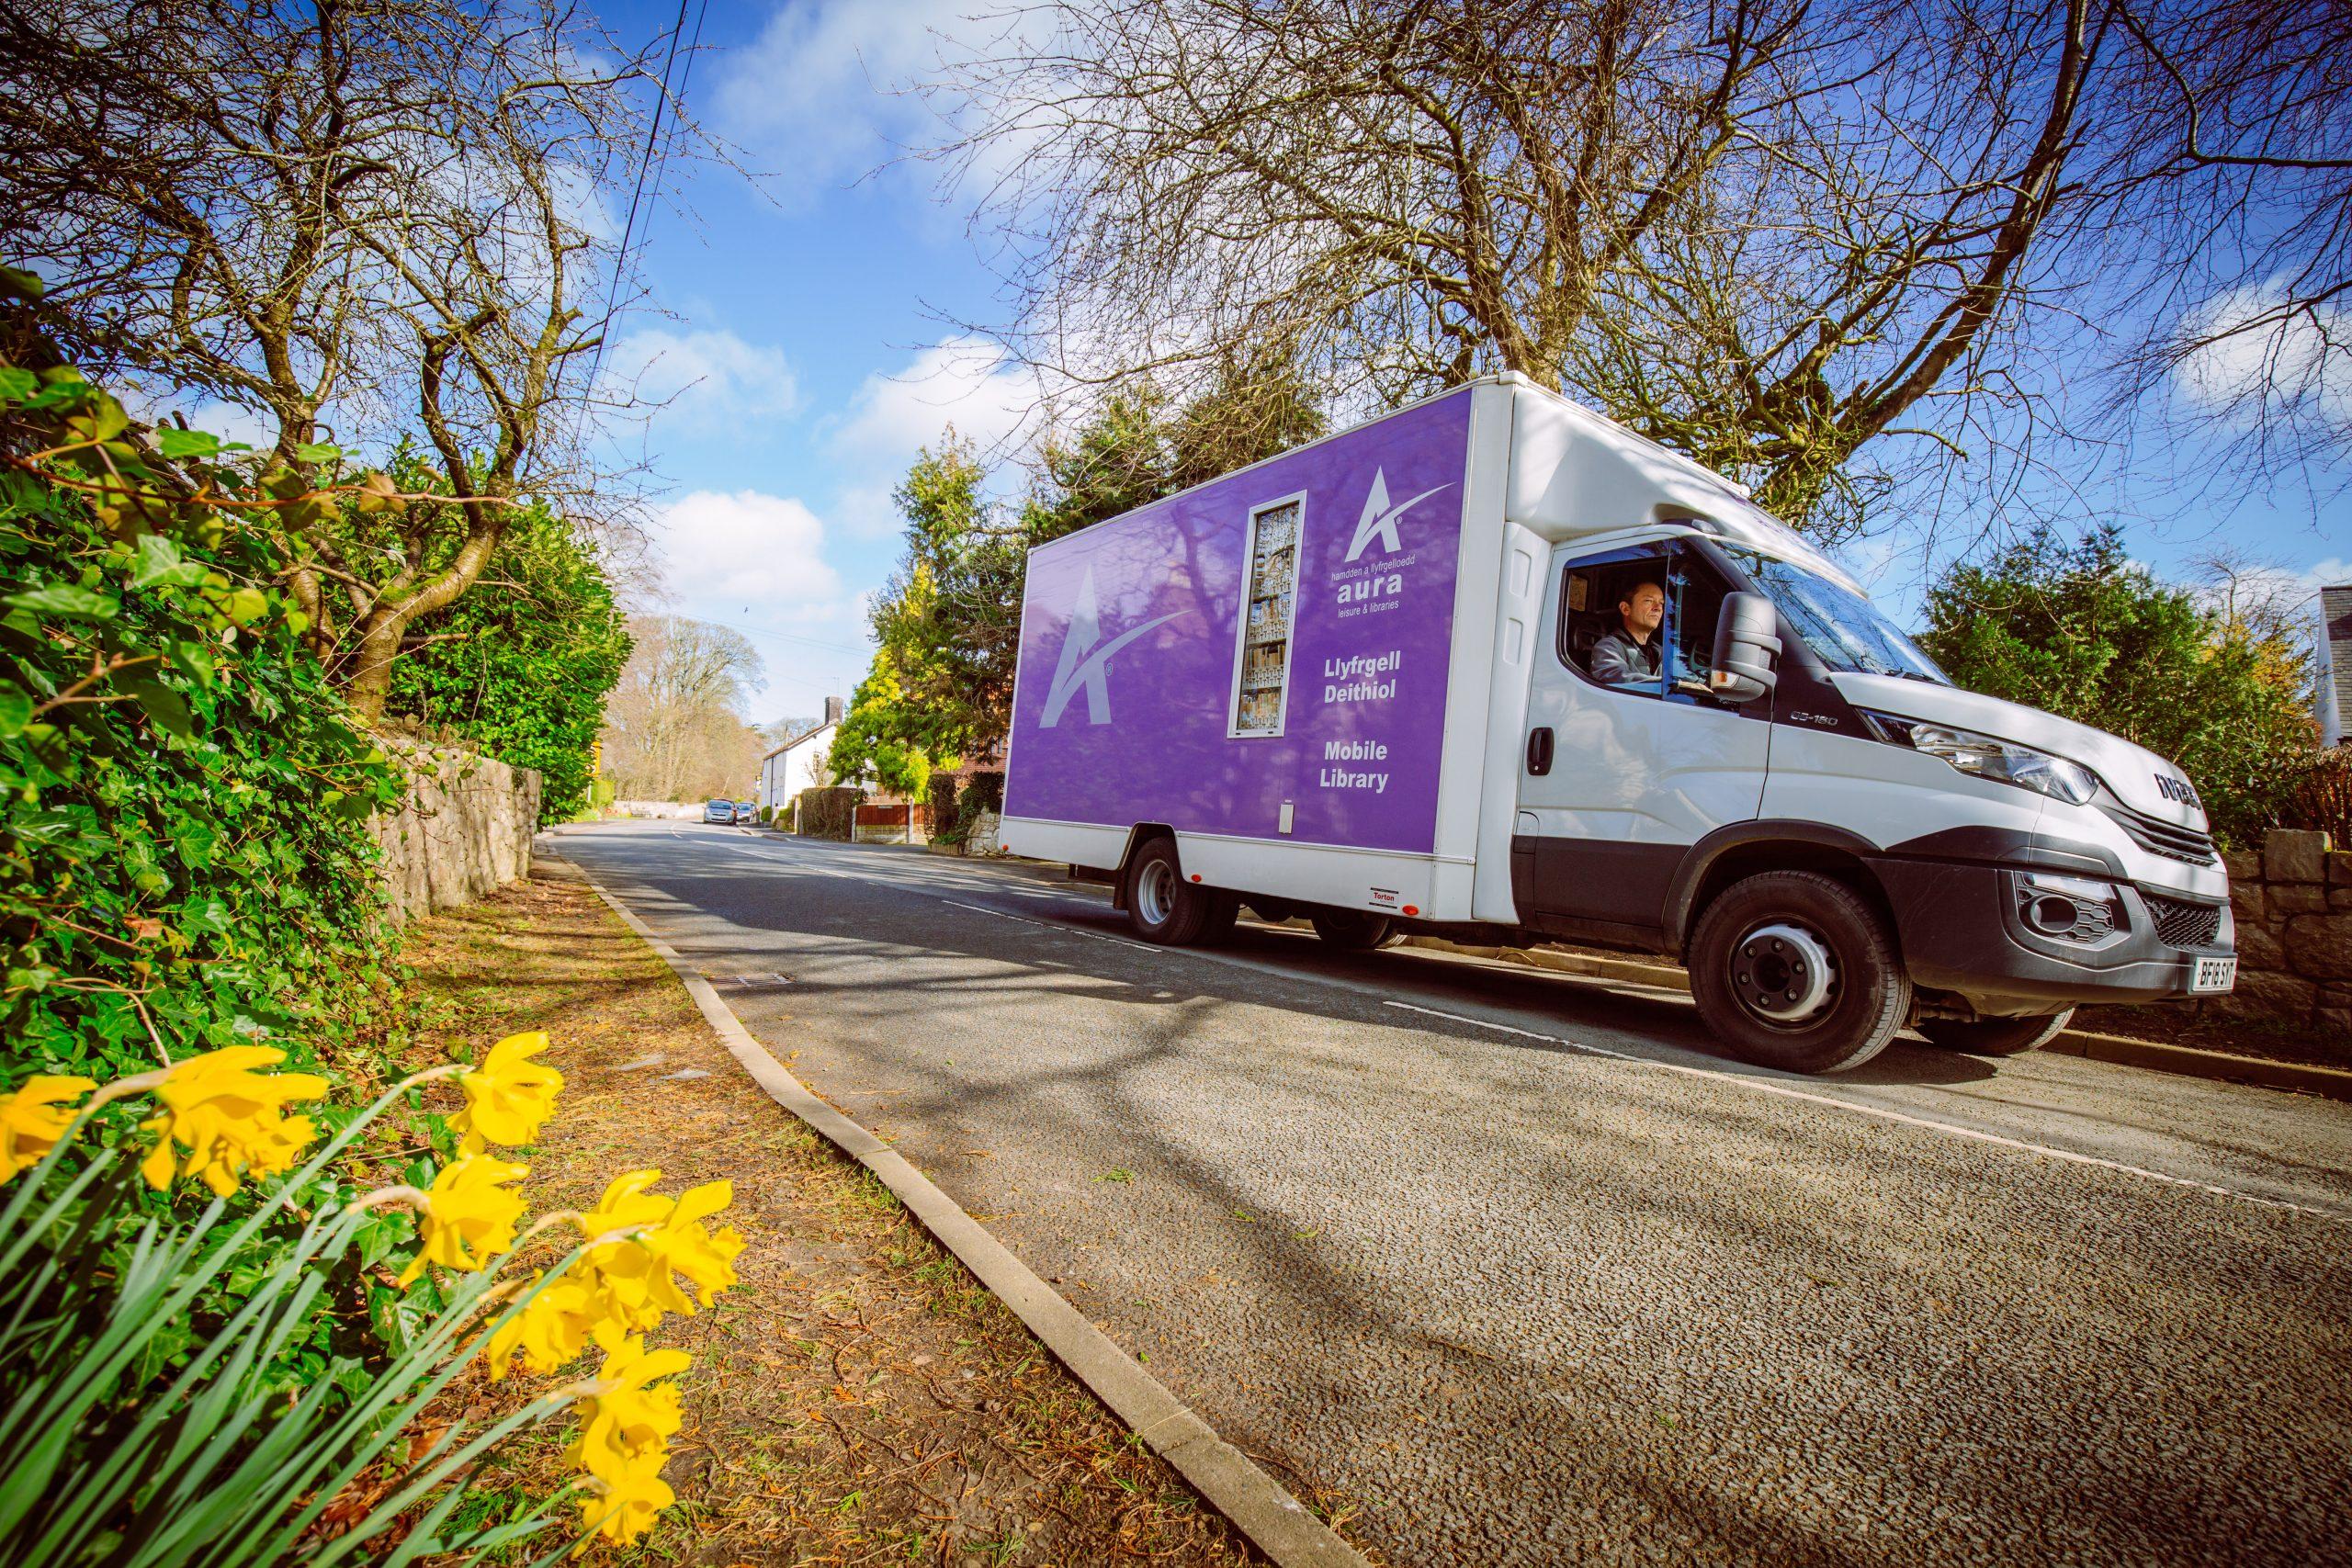 Aura Libraries Mobile Library Service Van